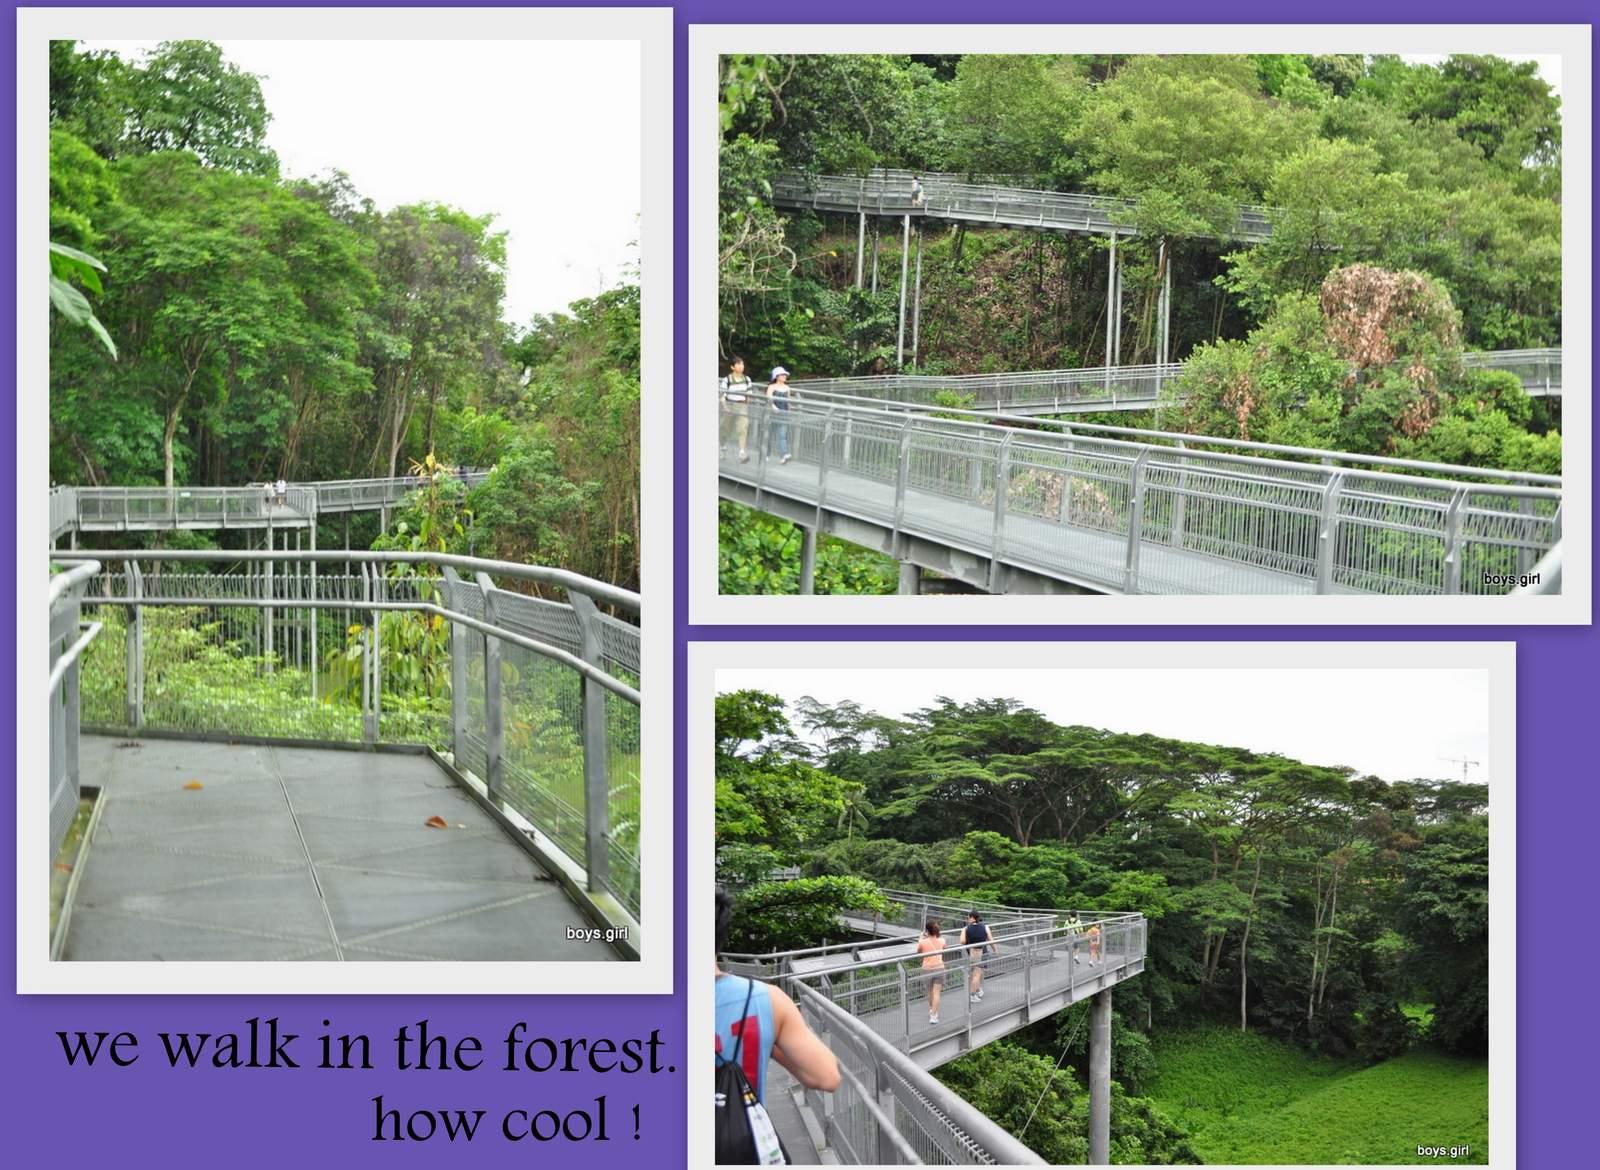 SengkangBabies: Southern Ridges Forest Walk